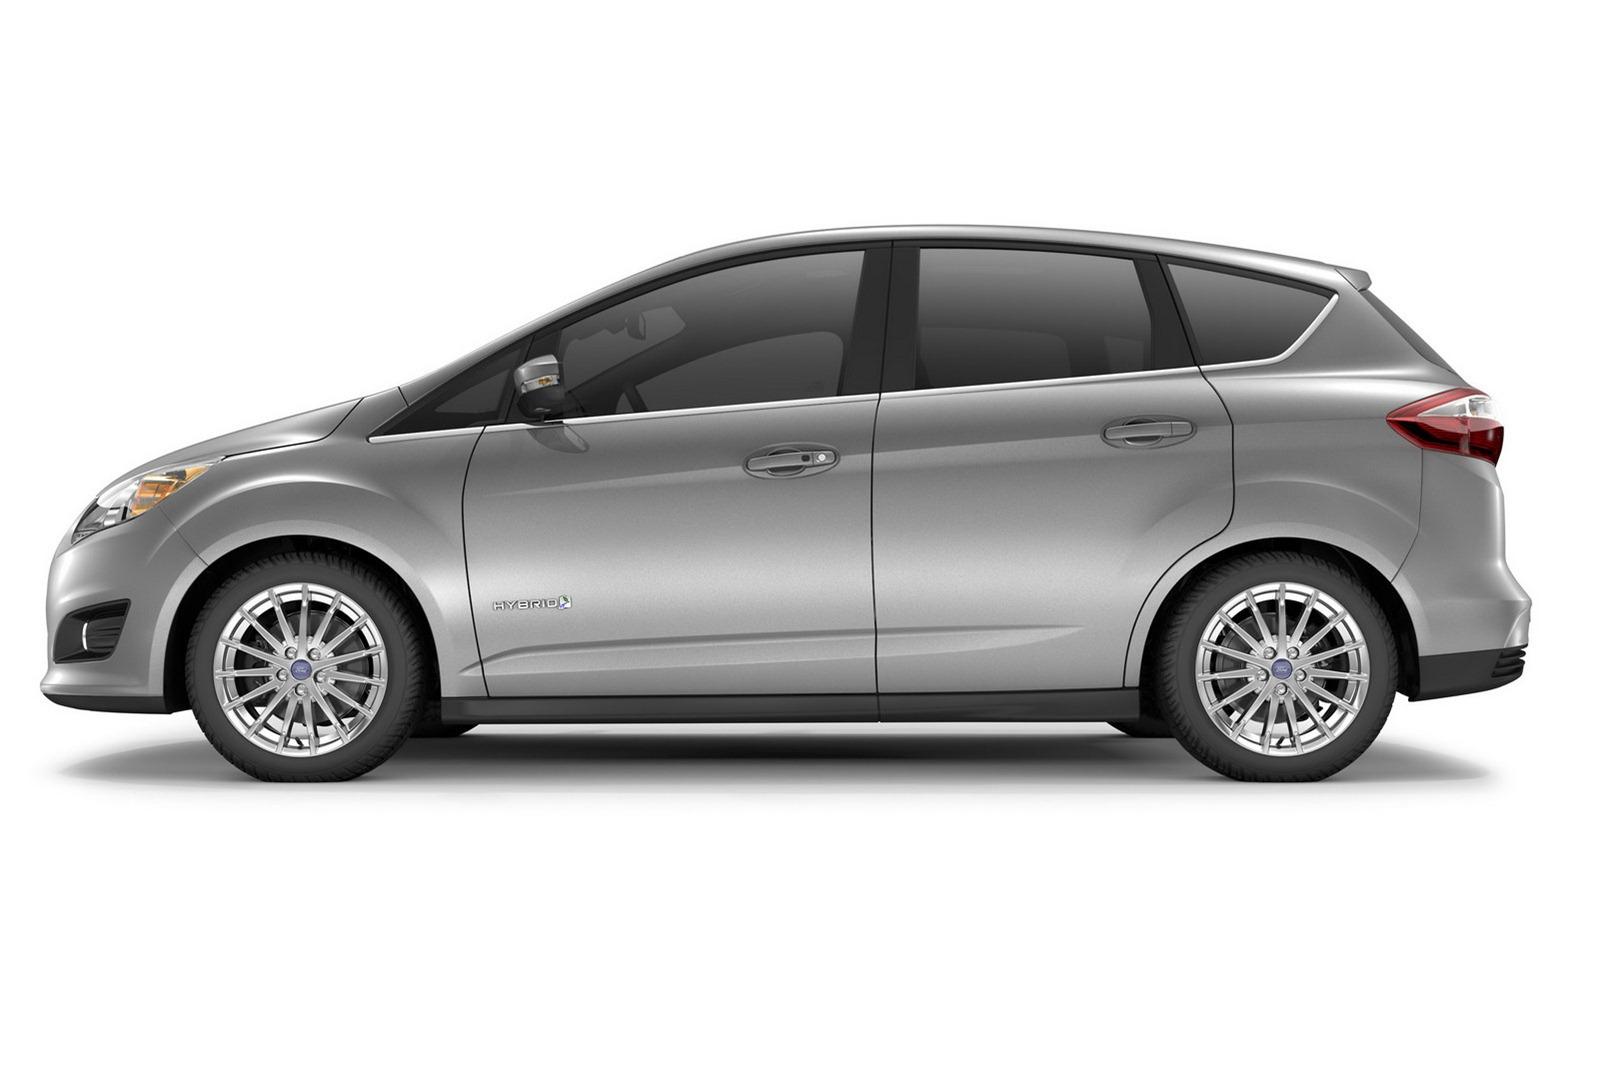 auto studio nouveau 2013 ford c max hybride prix 555 moins que la prius v 25 995. Black Bedroom Furniture Sets. Home Design Ideas